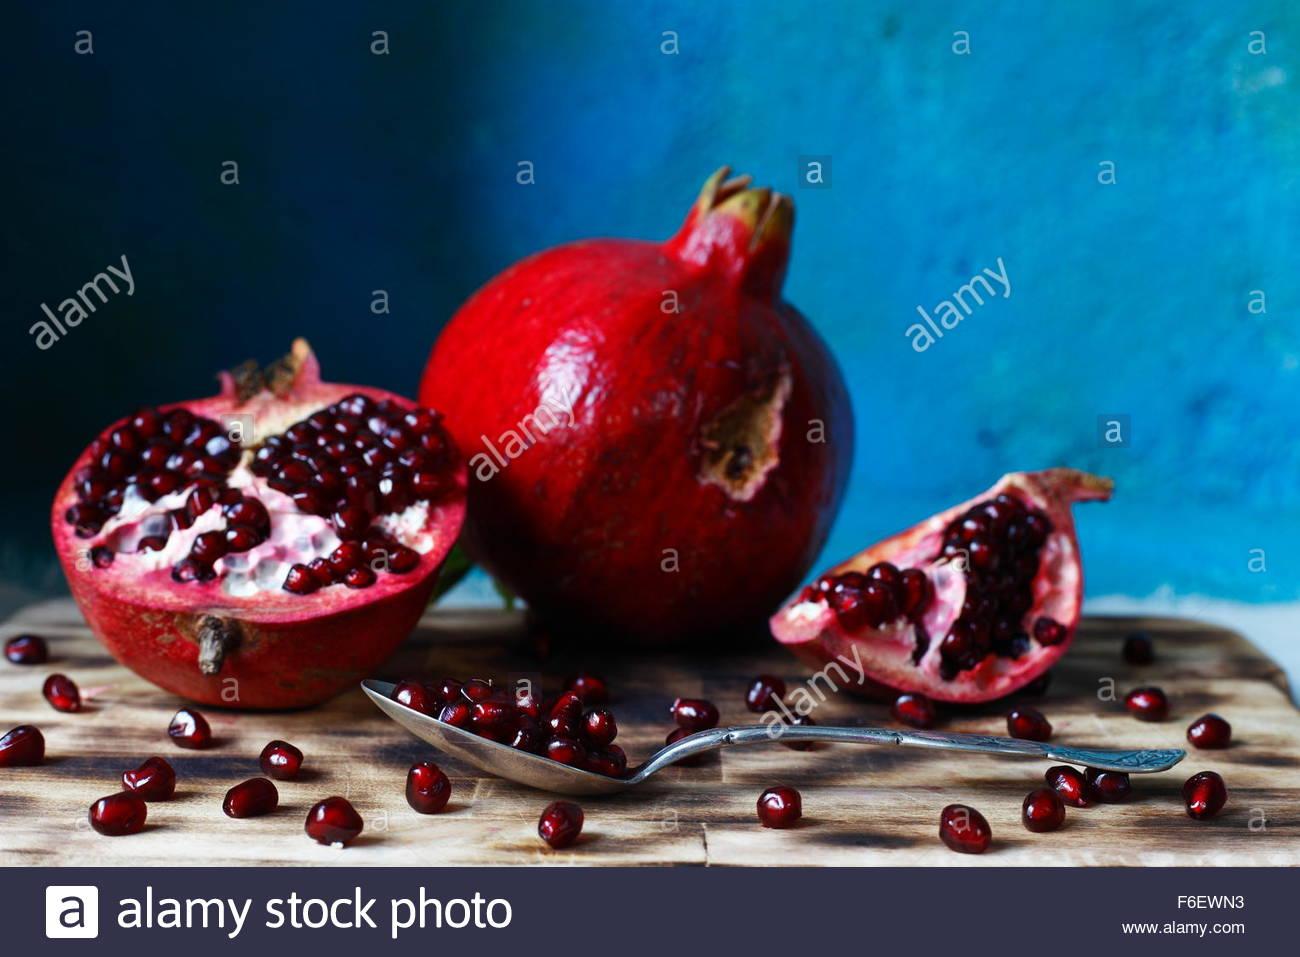 Granatapfel-Makro fotografiert bei Tageslicht, visuelle, Farbbild Stockbild